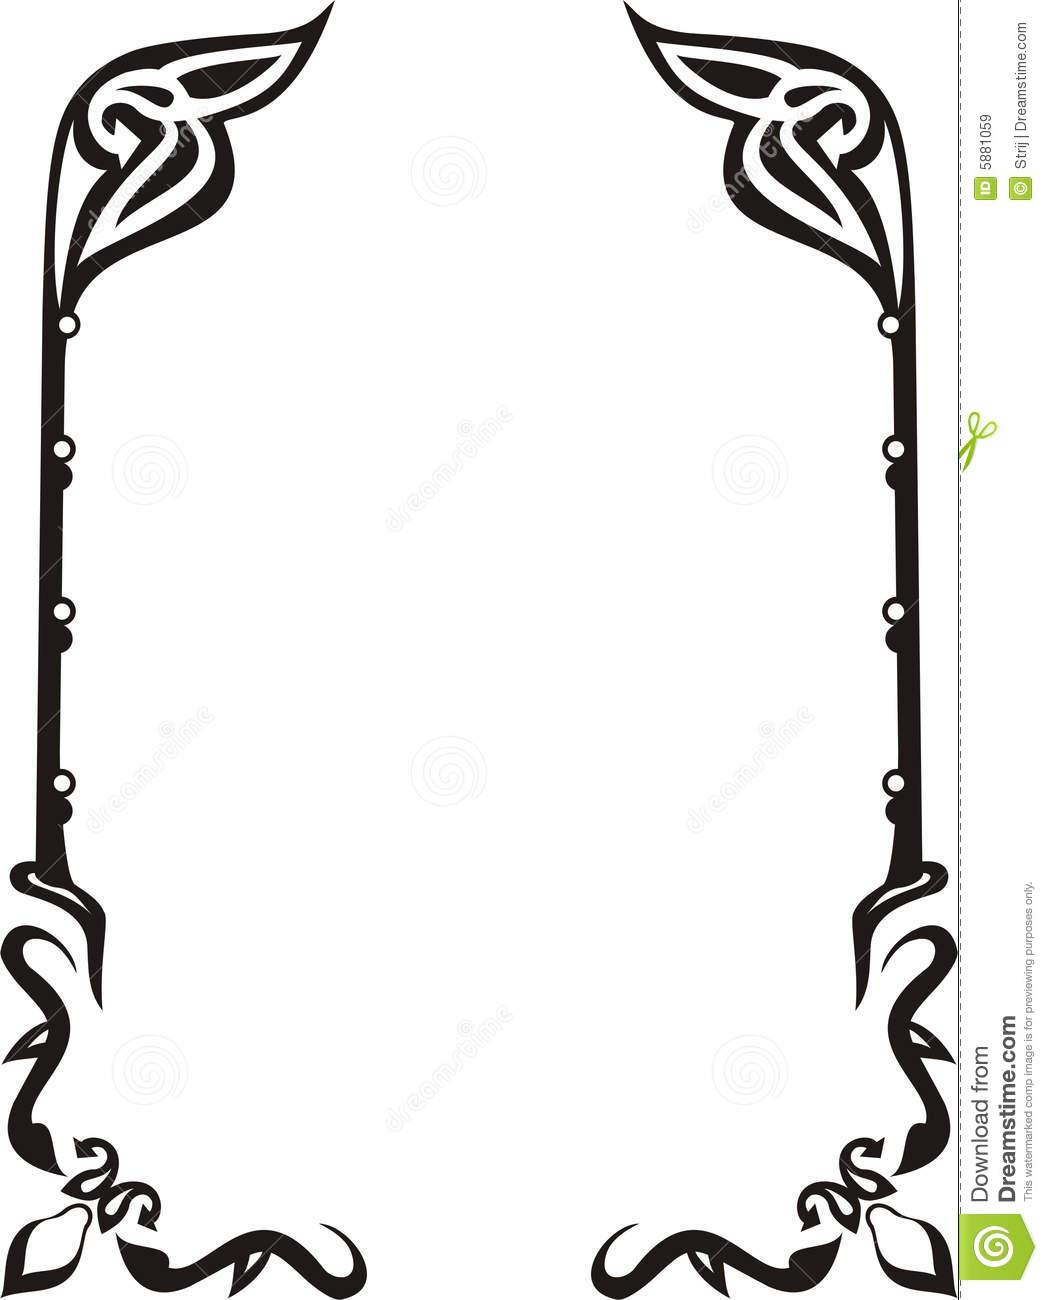 Eiland clipart lone Art frame Dragons dragon 2